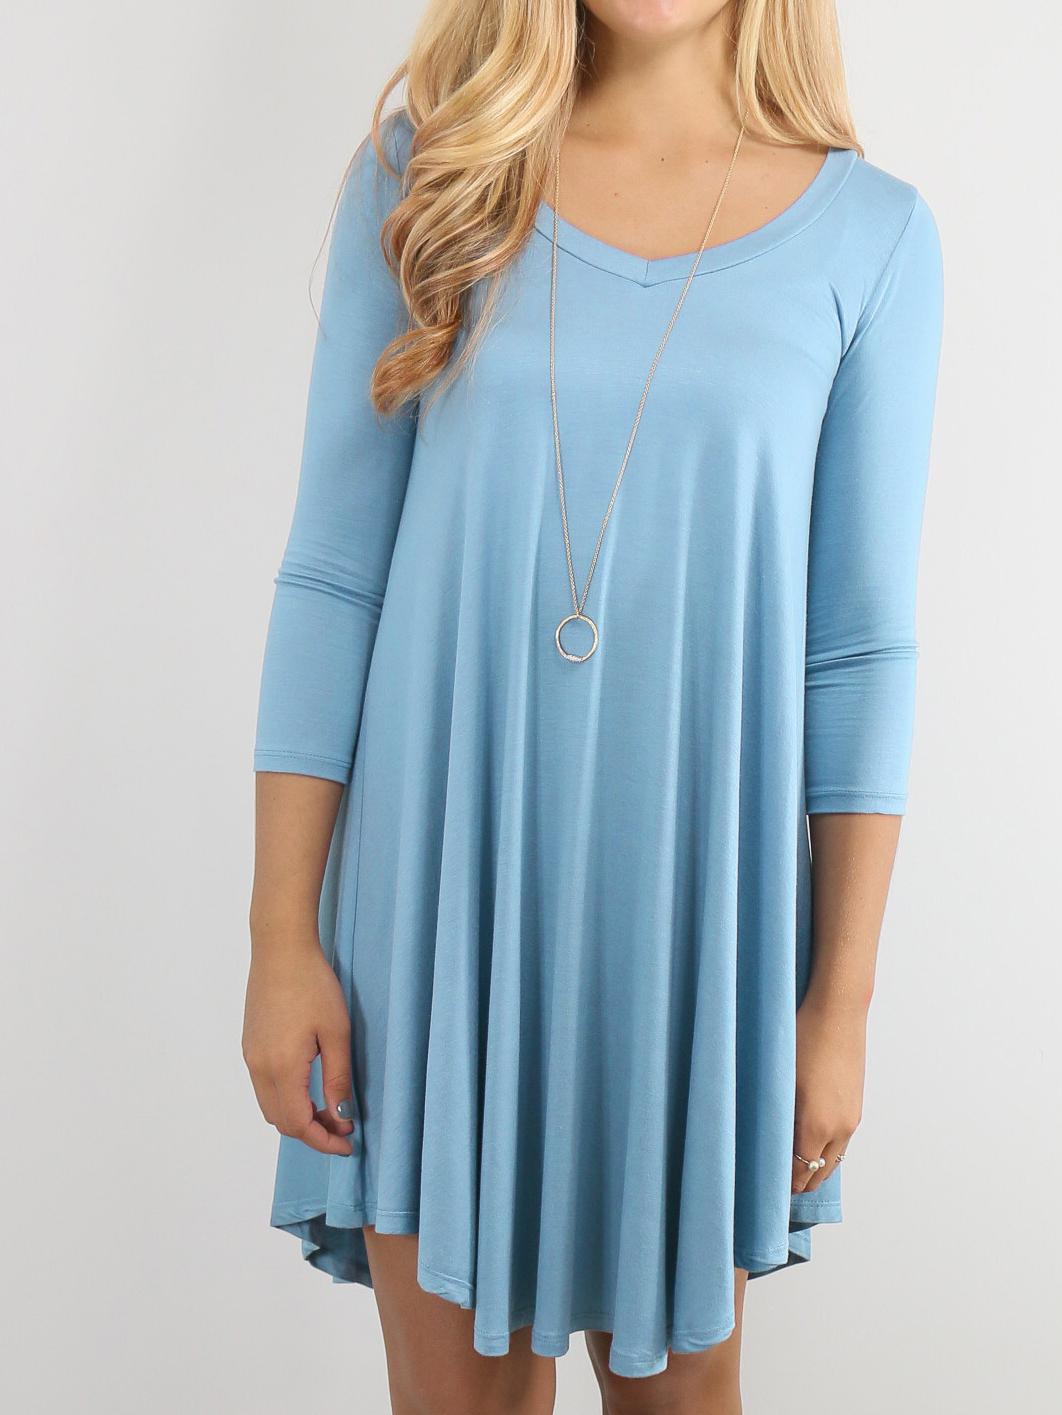 547035d7a2fe34 Blue V-Neck Long Sleeve Tshirt Dress -SheIn(Sheinside)